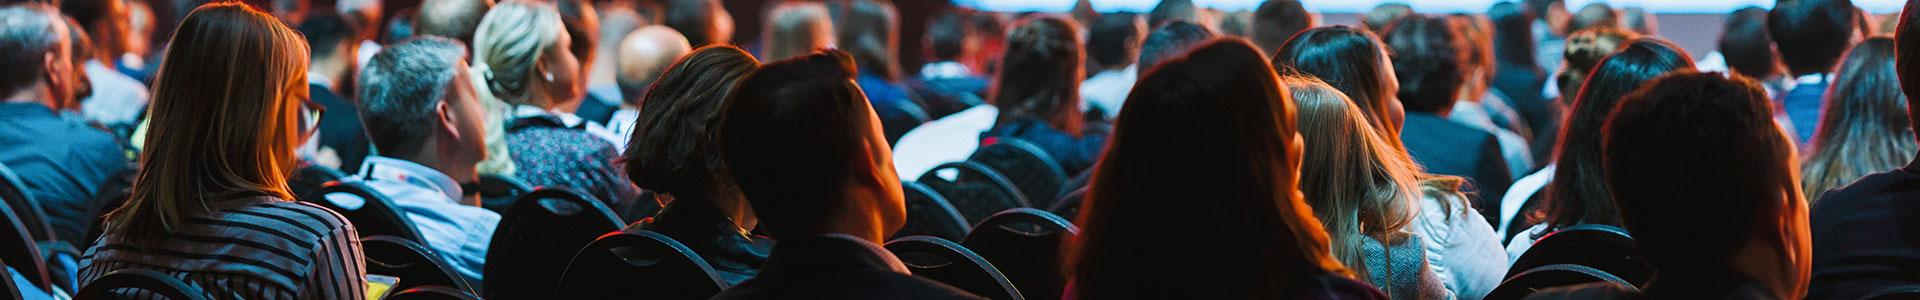 Vortrag_Audience